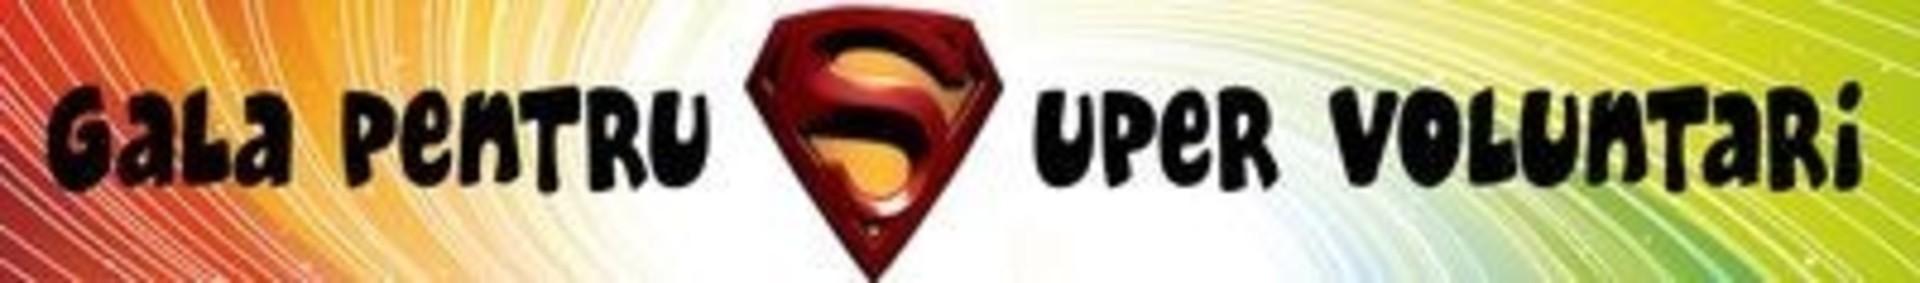 Gala pentru Supervoluntari 2010. Voteaza online!